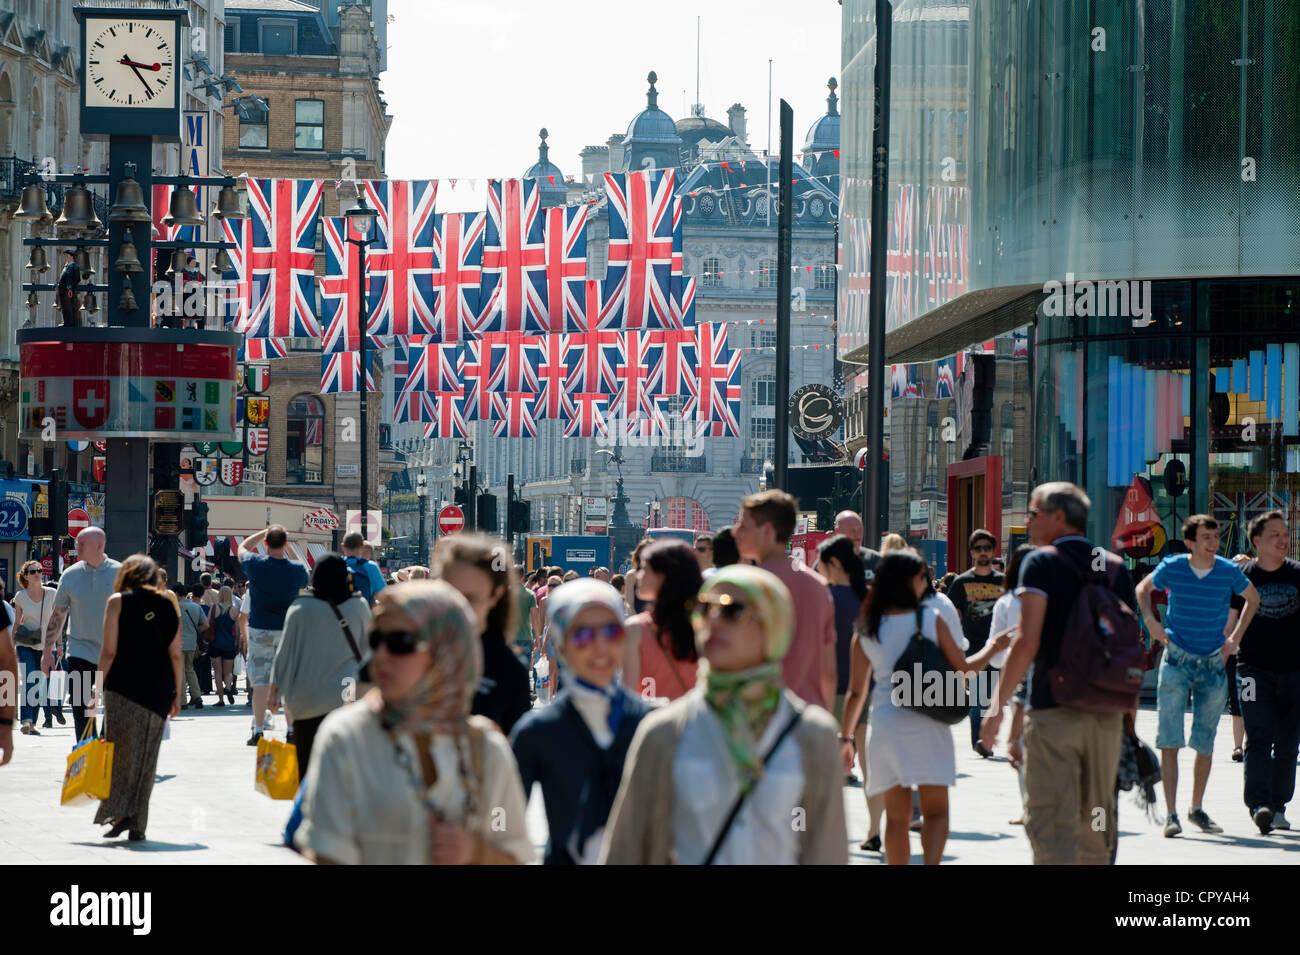 Leicester Square, London, United Kingdom - Stock Image